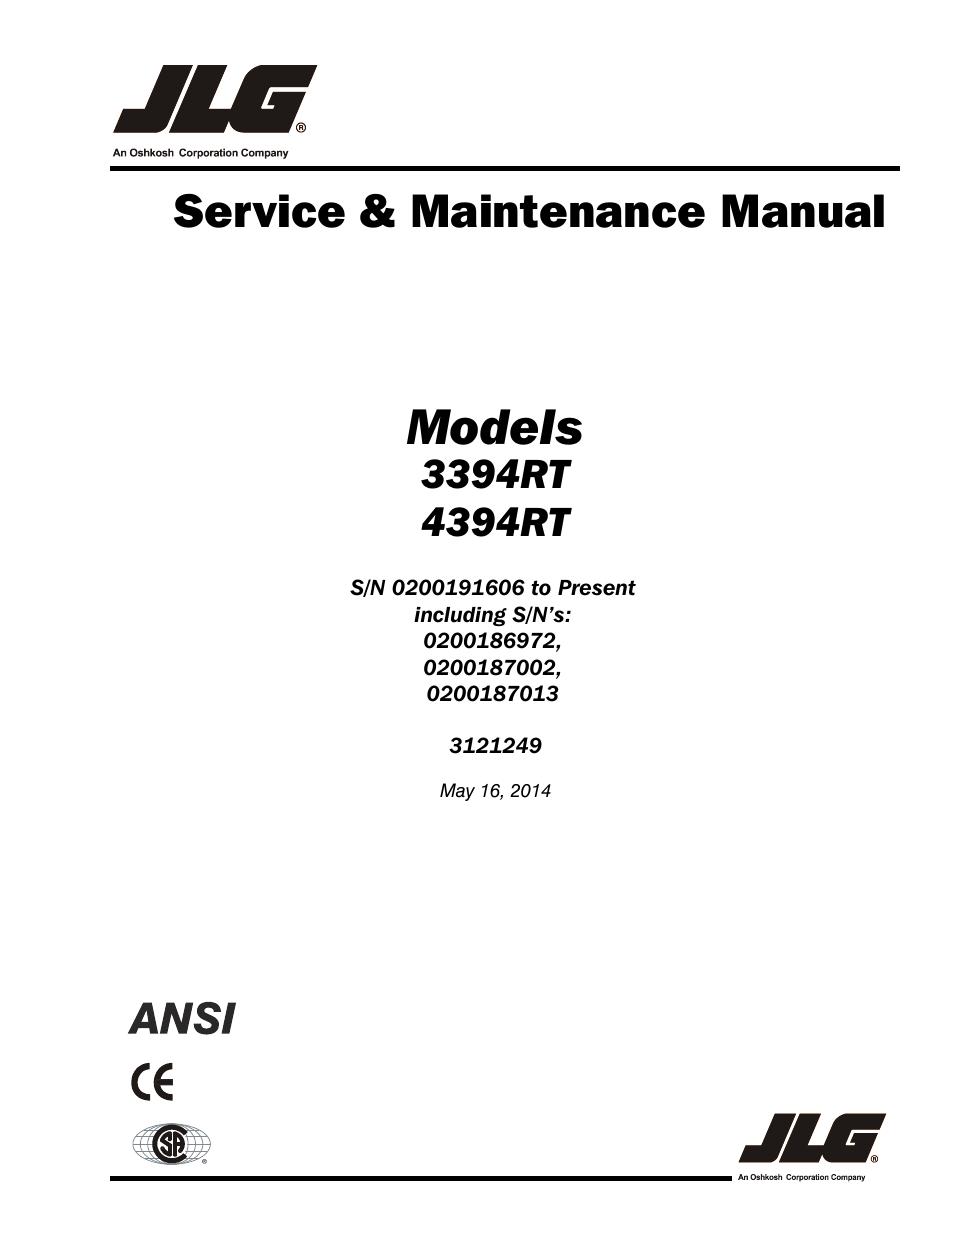 3394rt jlg wiring schematic circuit diagram symbols u2022 rh blogospheree com JLG 3246ES Specs JLG 2646